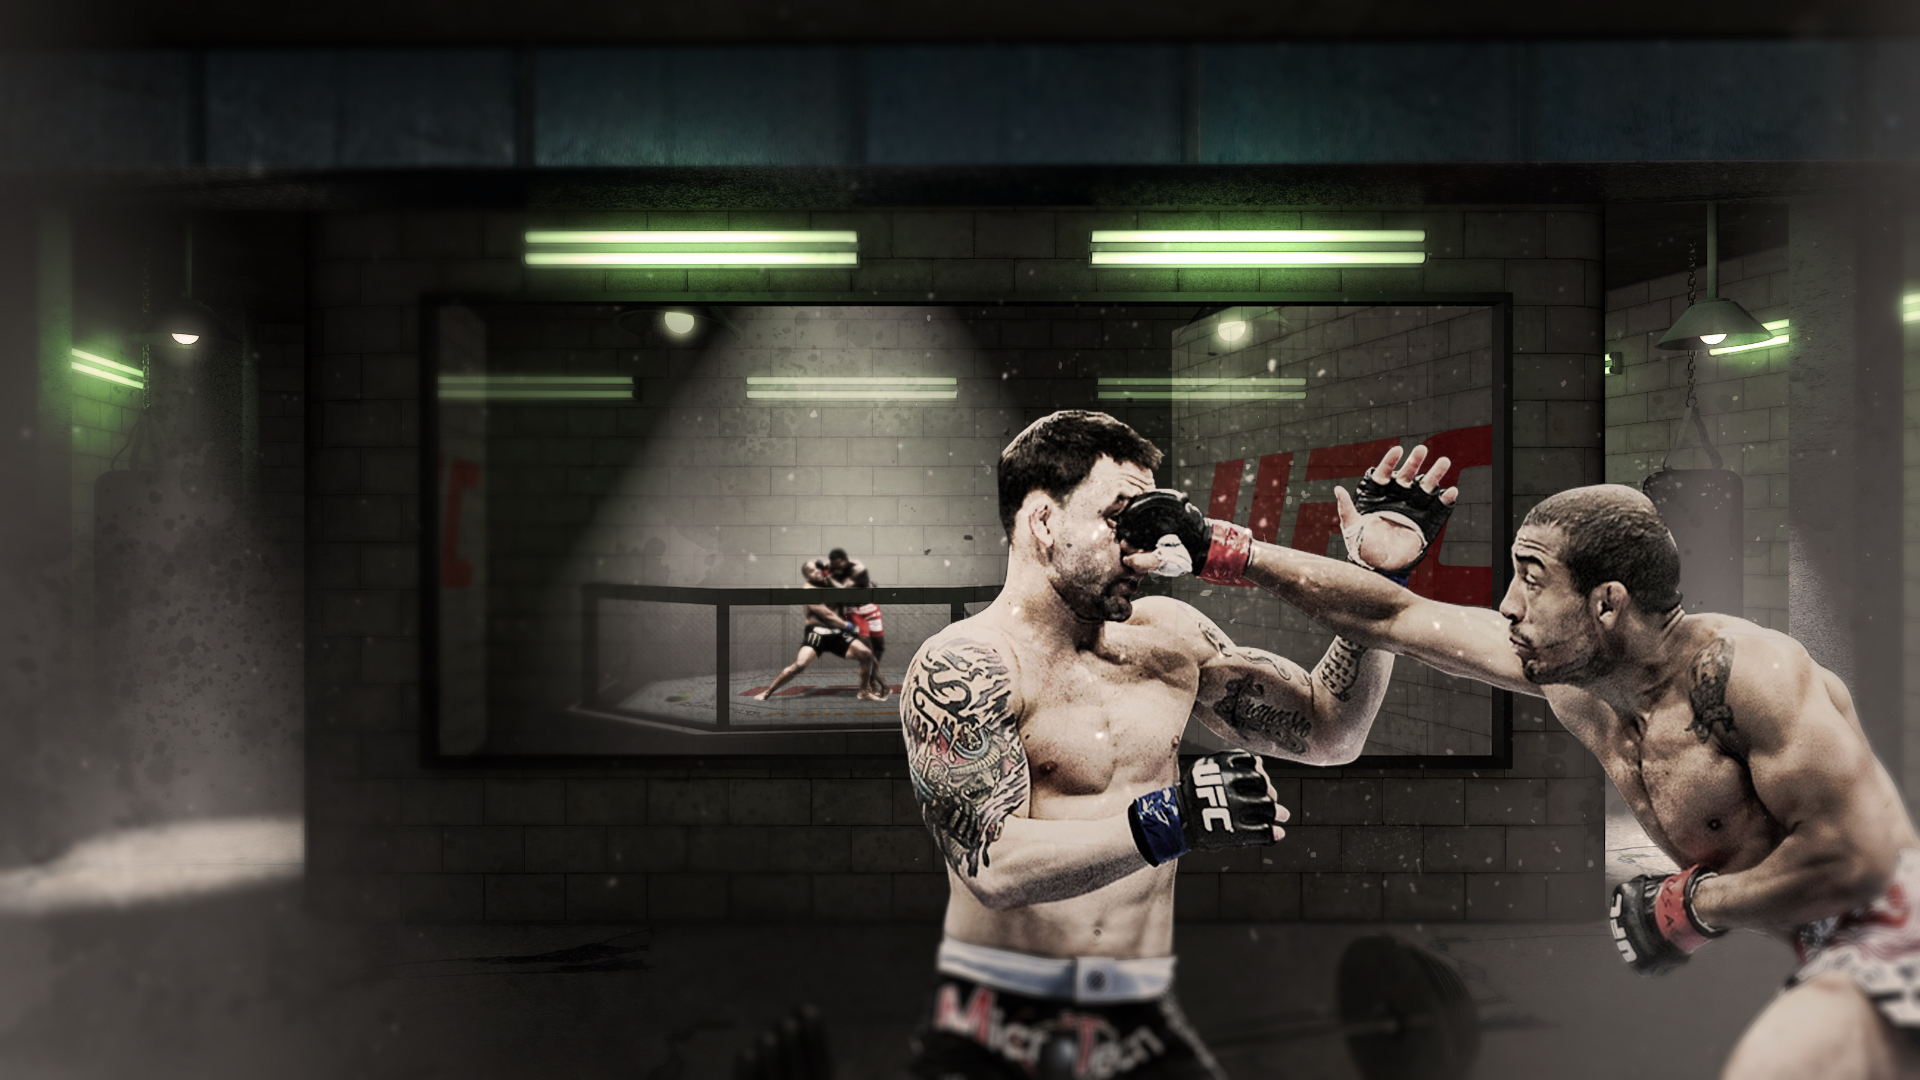 UFC_StyleFrameV2_Frame10_V2.jpg